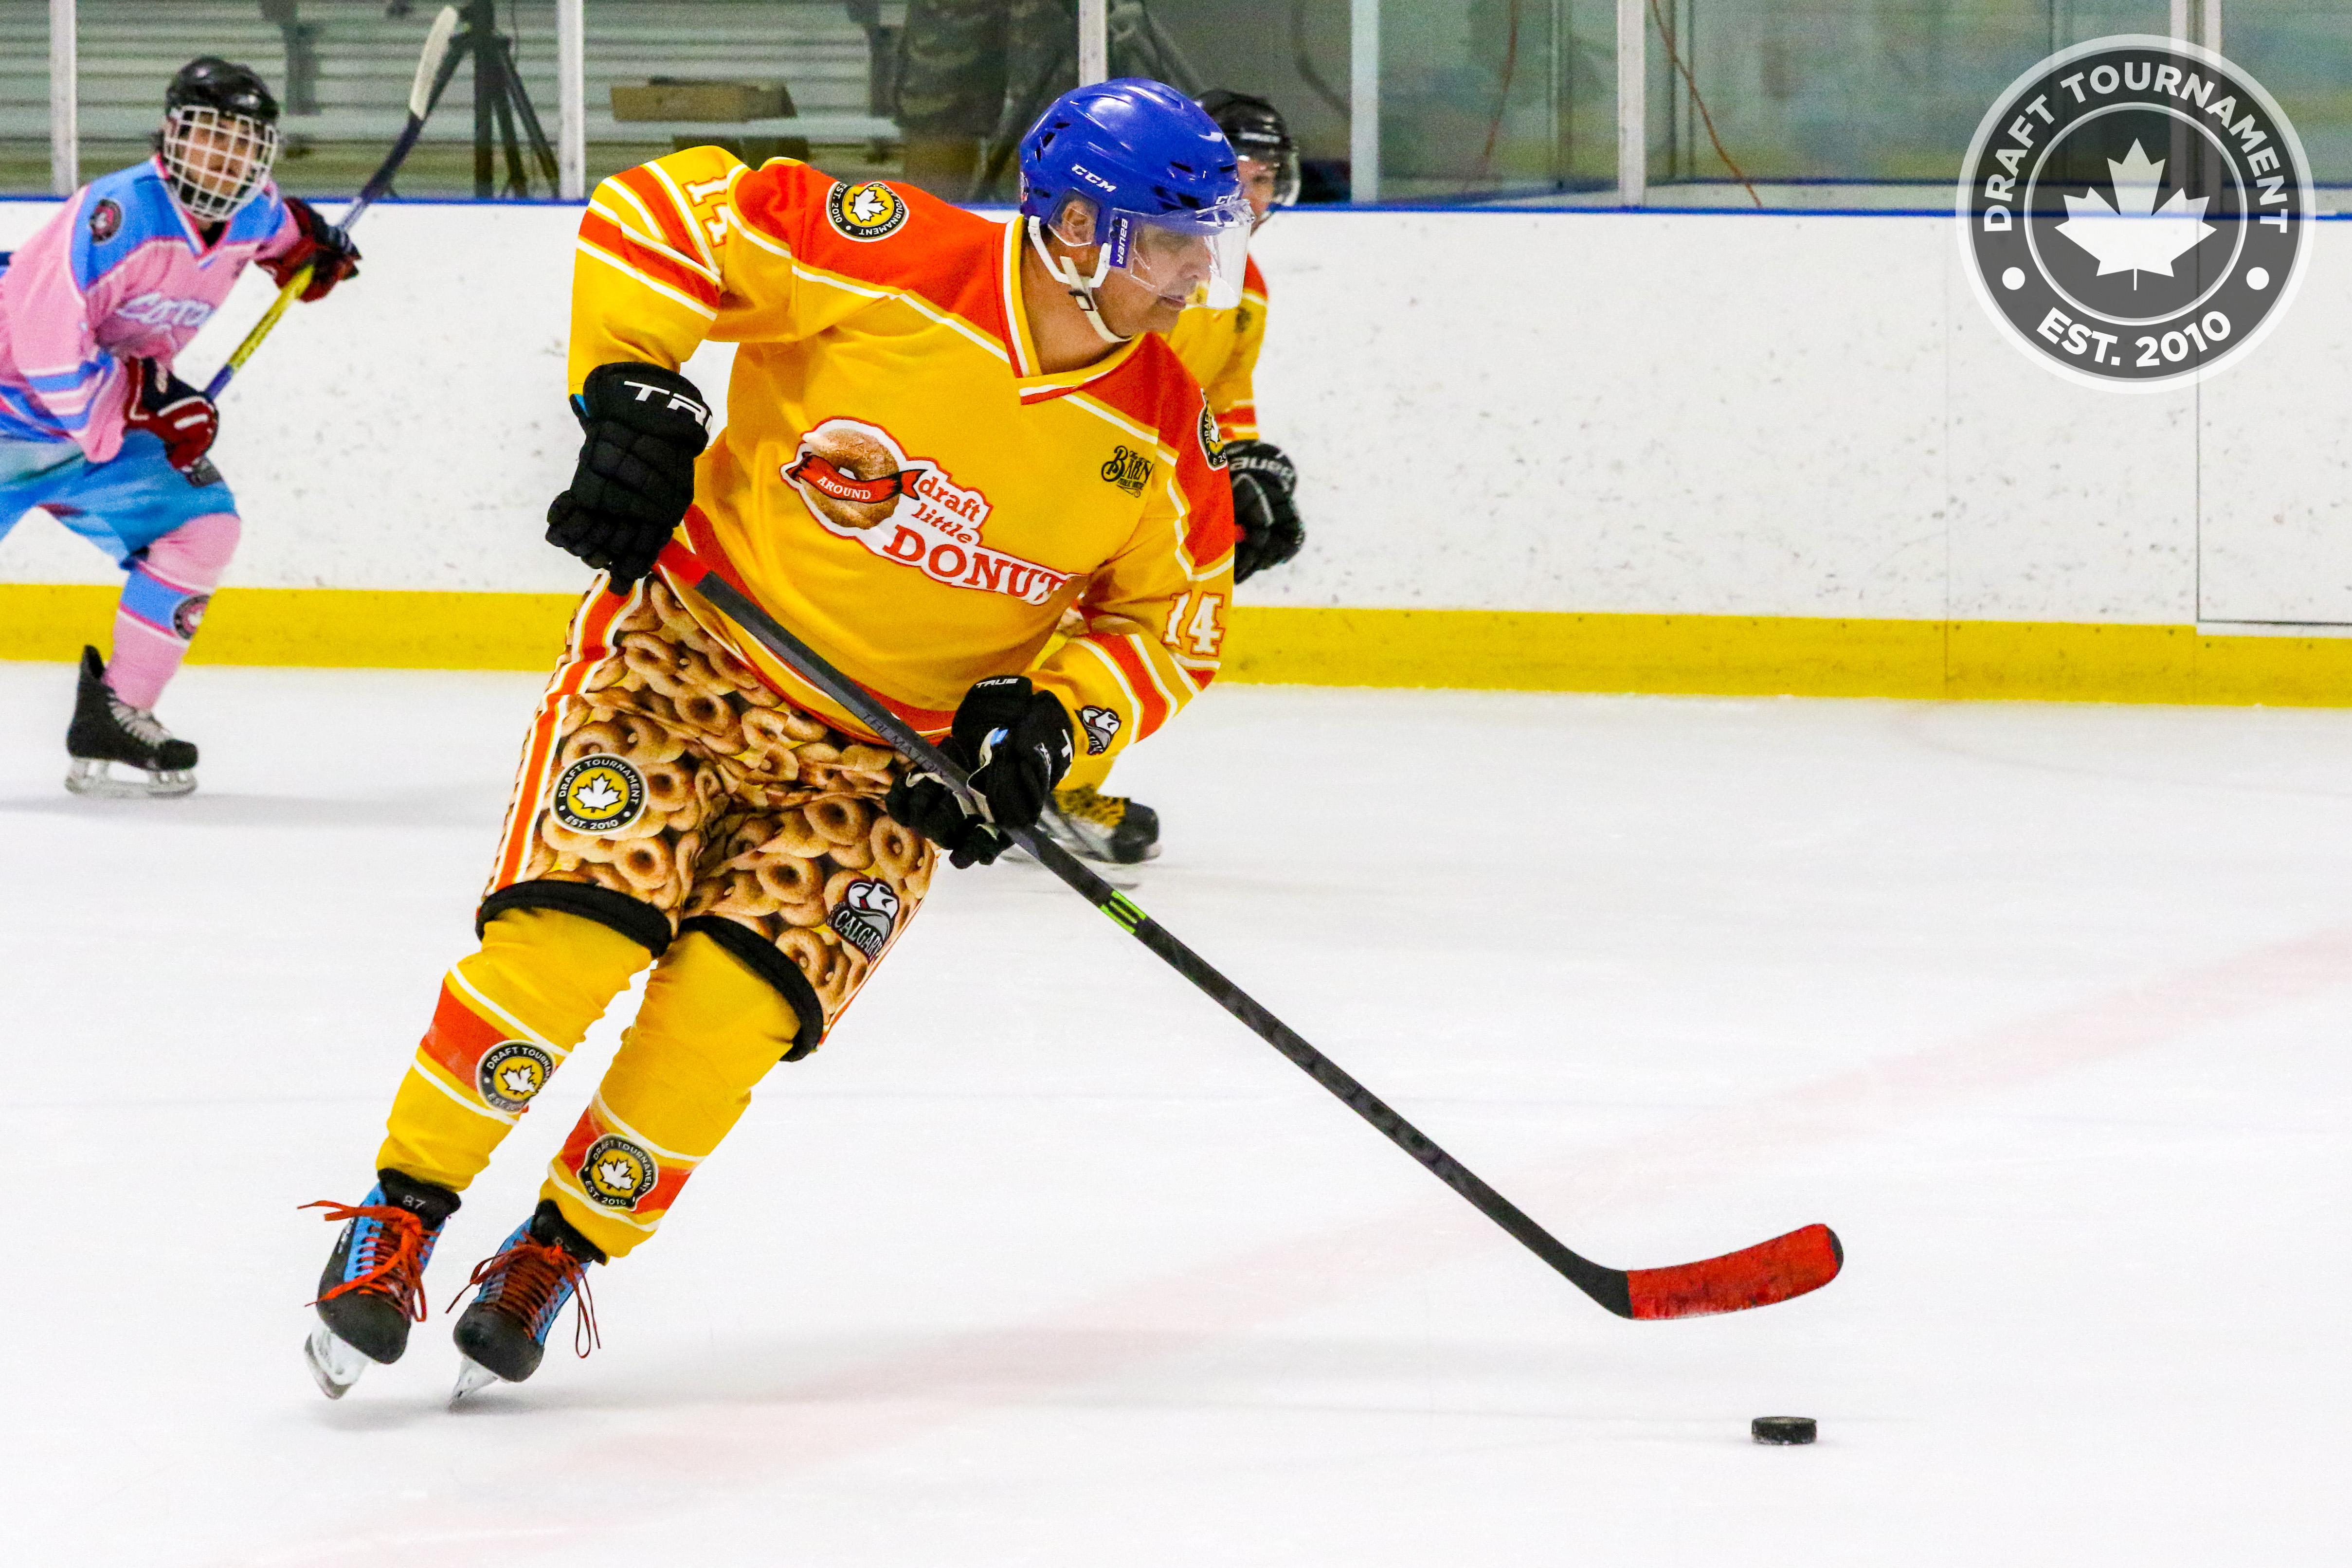 Calgary Alberta Adult Beer League Rec Hockey Tournament 5